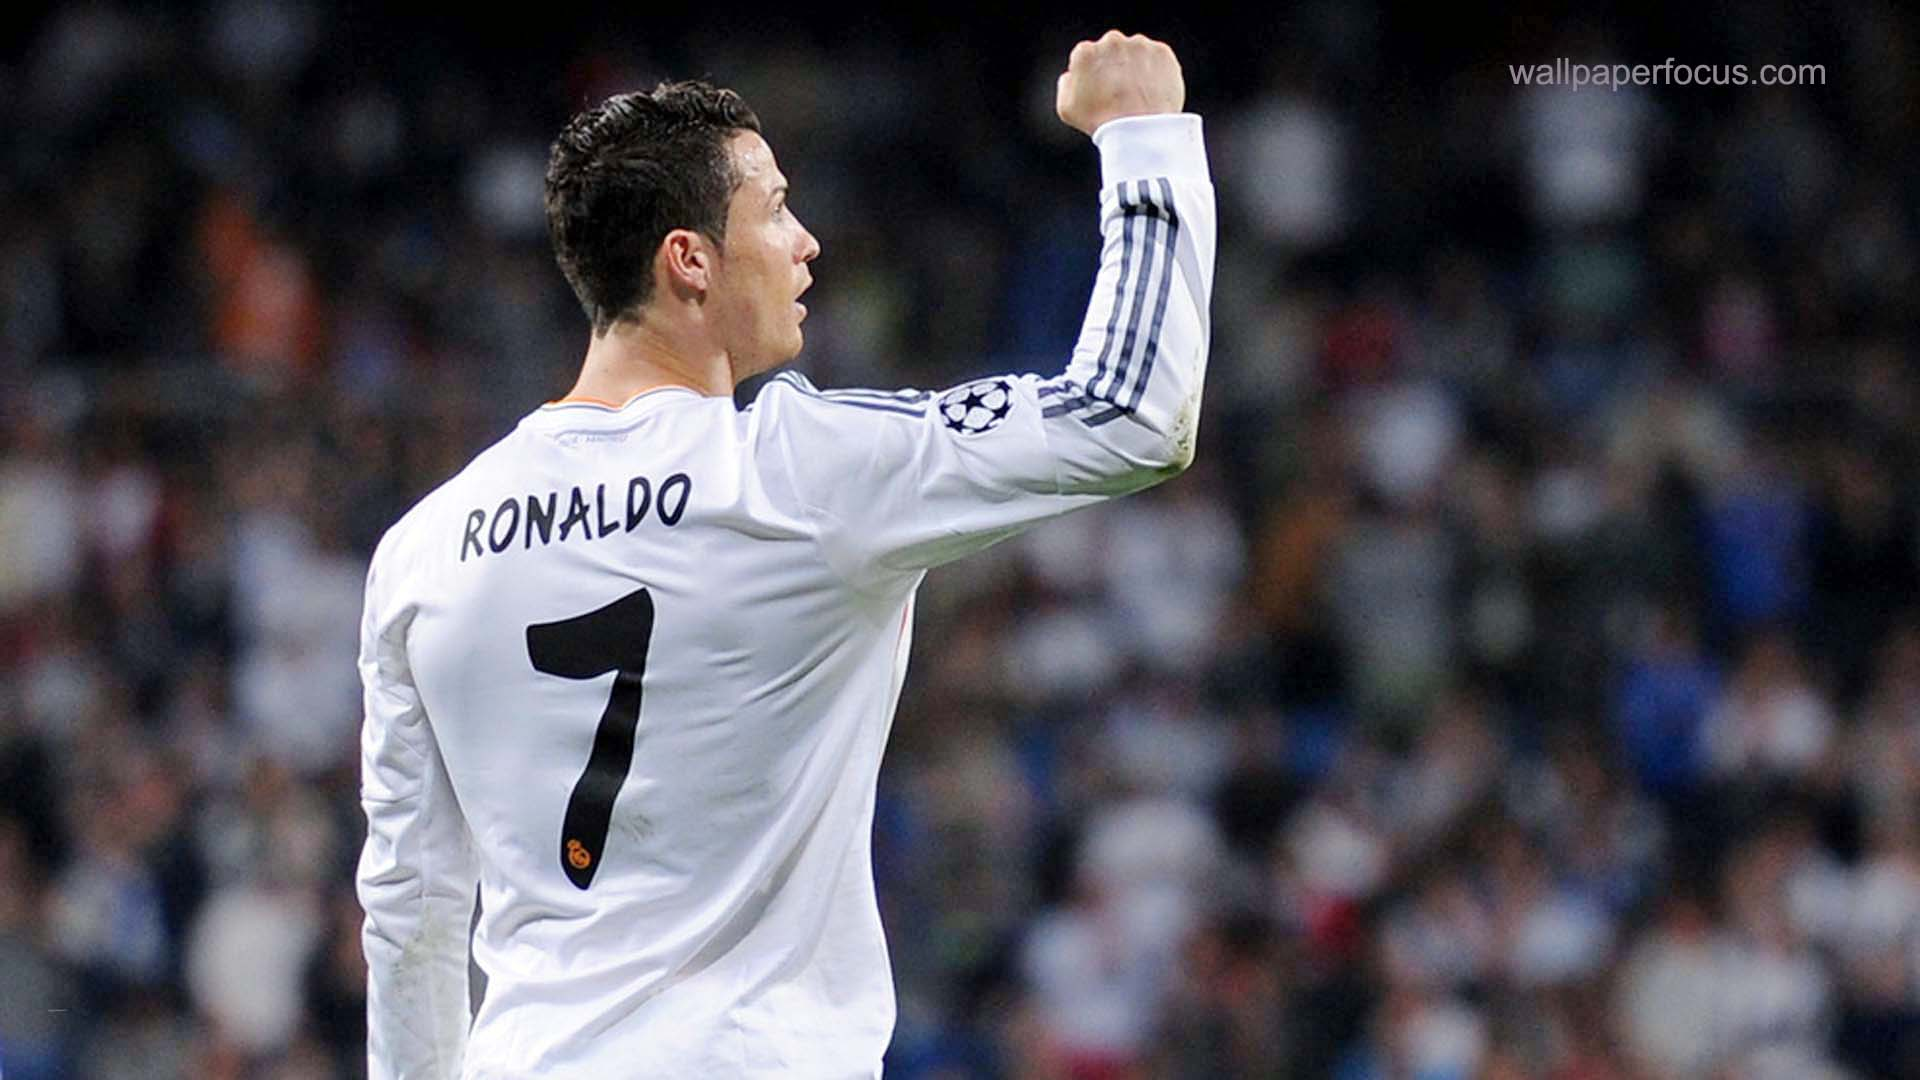 Cristiano Ronaldo Hd Wallpapers Top Free Cristiano Ronaldo